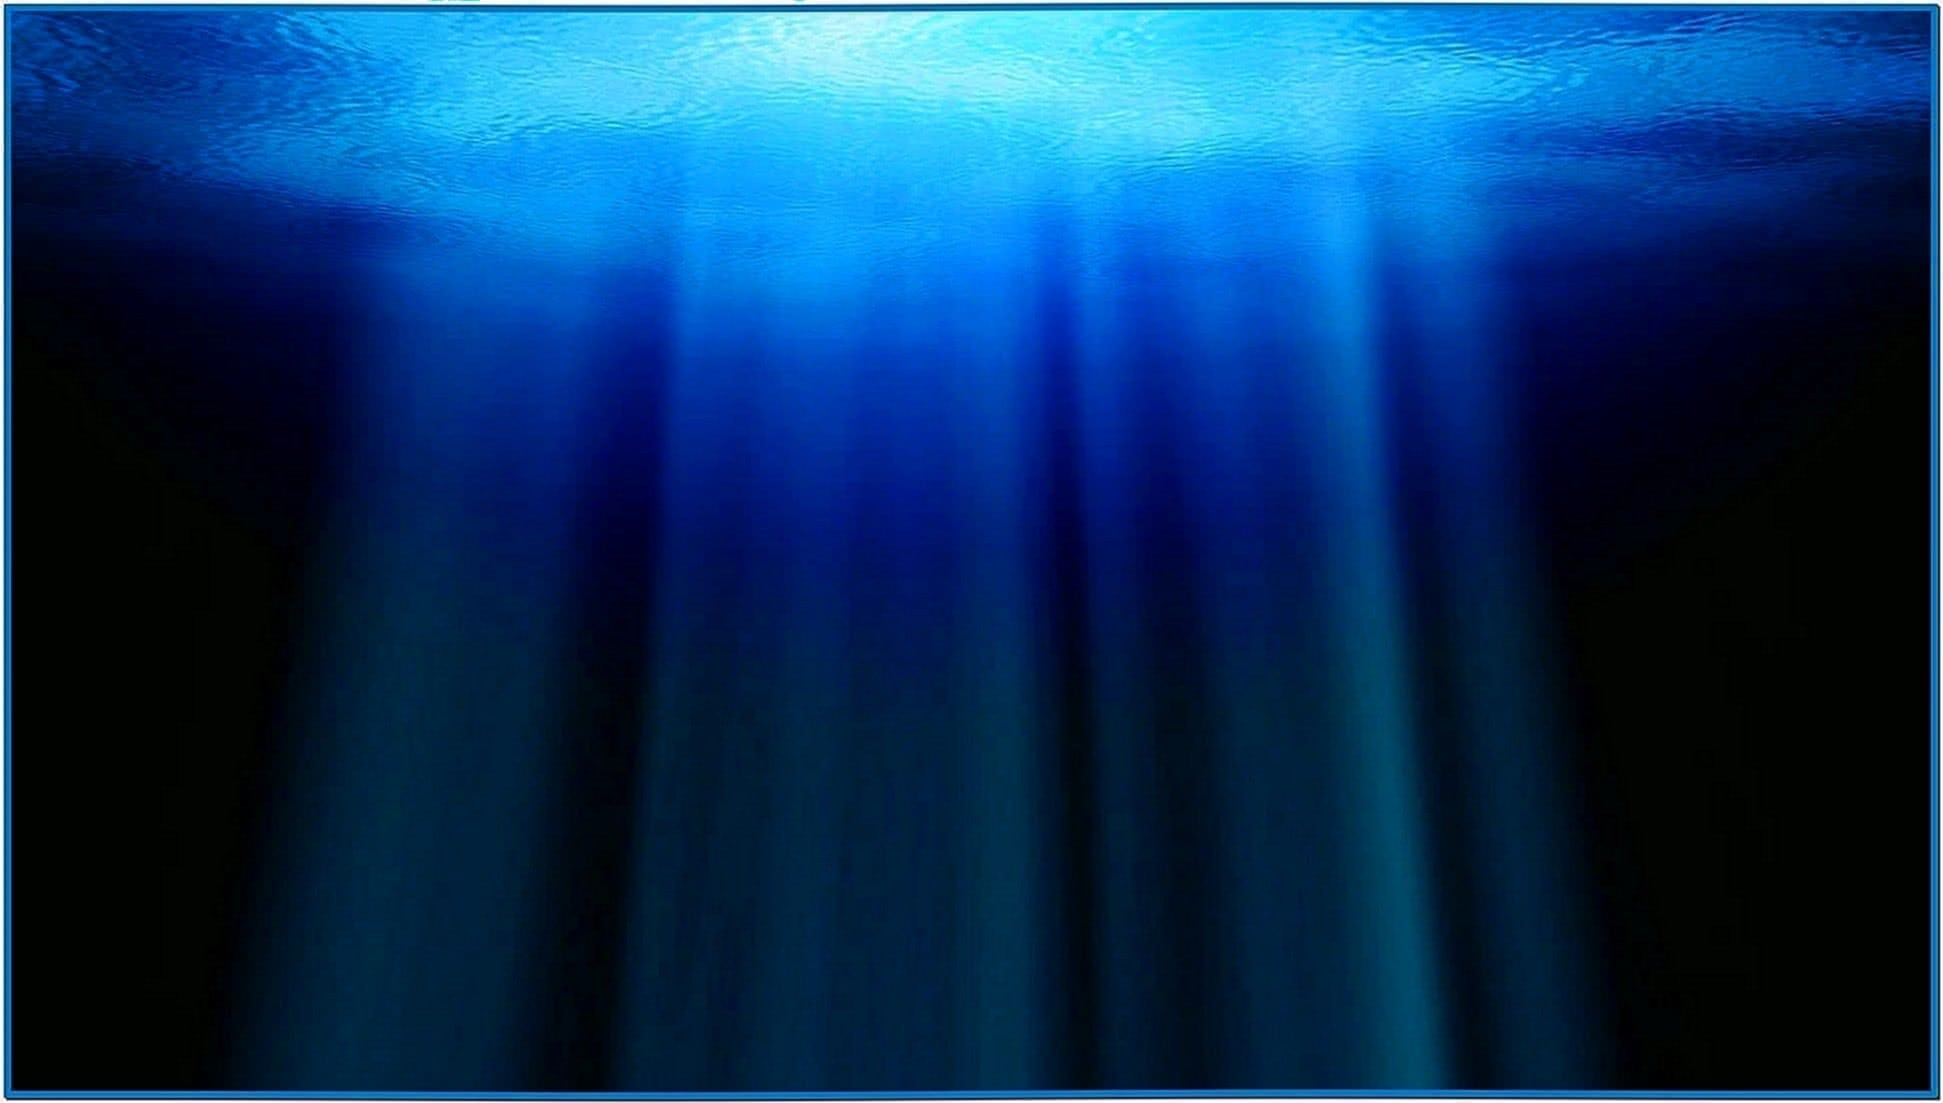 Compiz Water Effect Screensaver